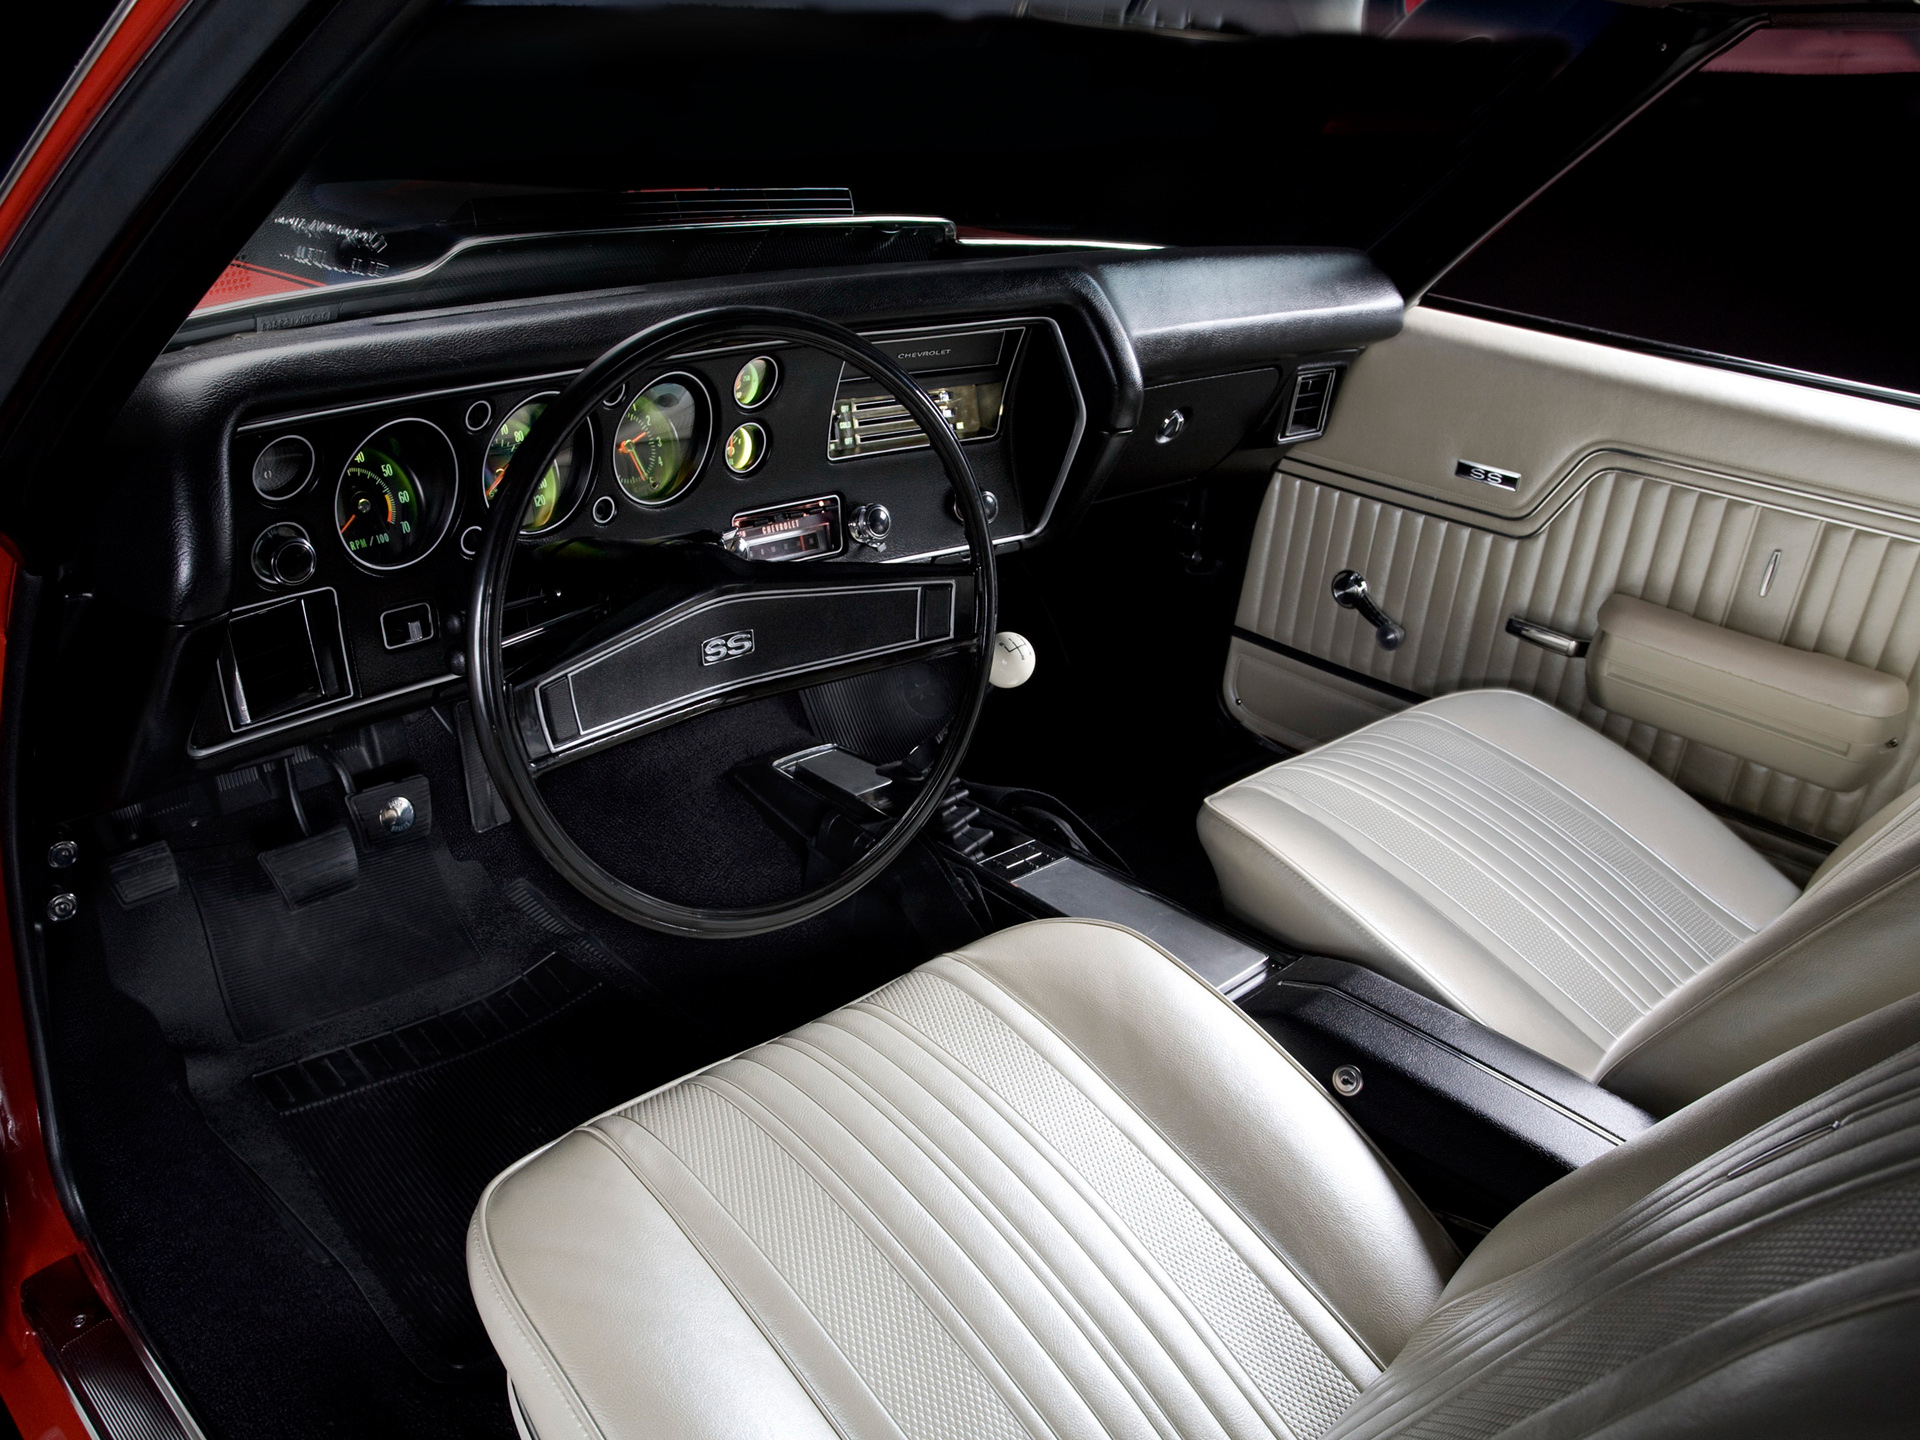 1970 Chevrolet Chevelle Ss 454 Ls6 Hardtop Coupe Muscle Classic S S Interior E Wallpaper